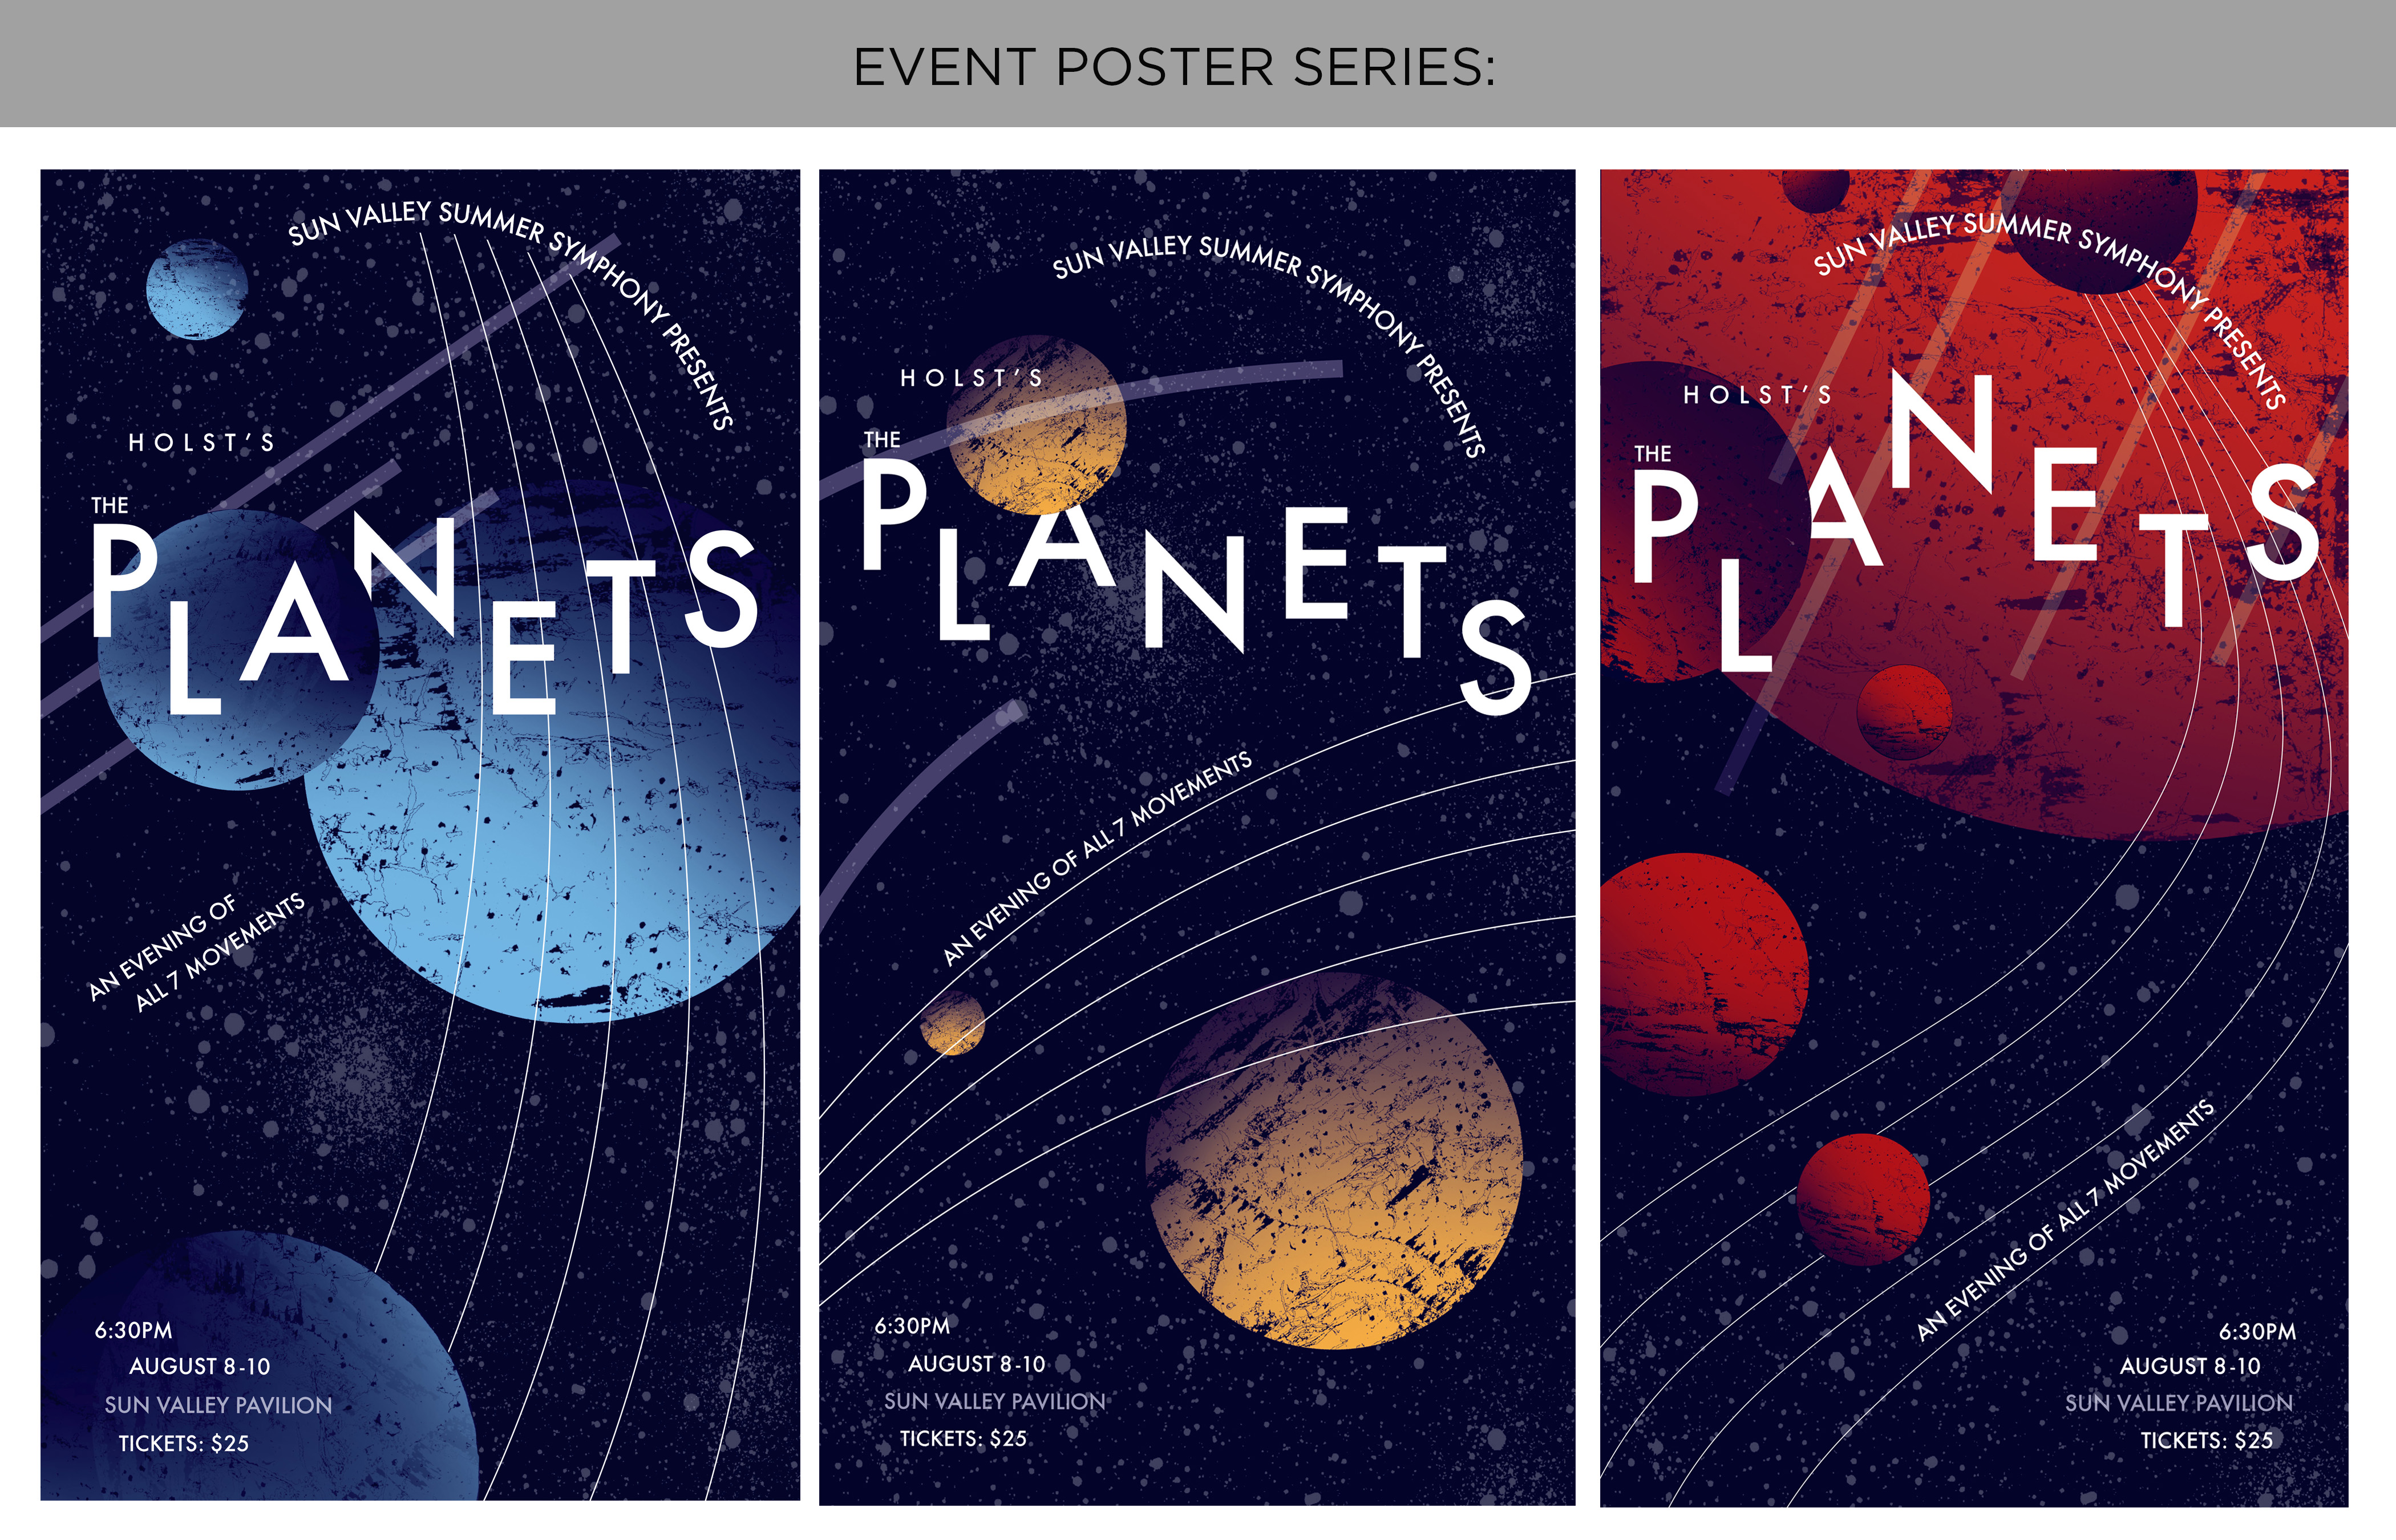 Gustav Holst* Holst - The Planets • The Mystic Trumpeter